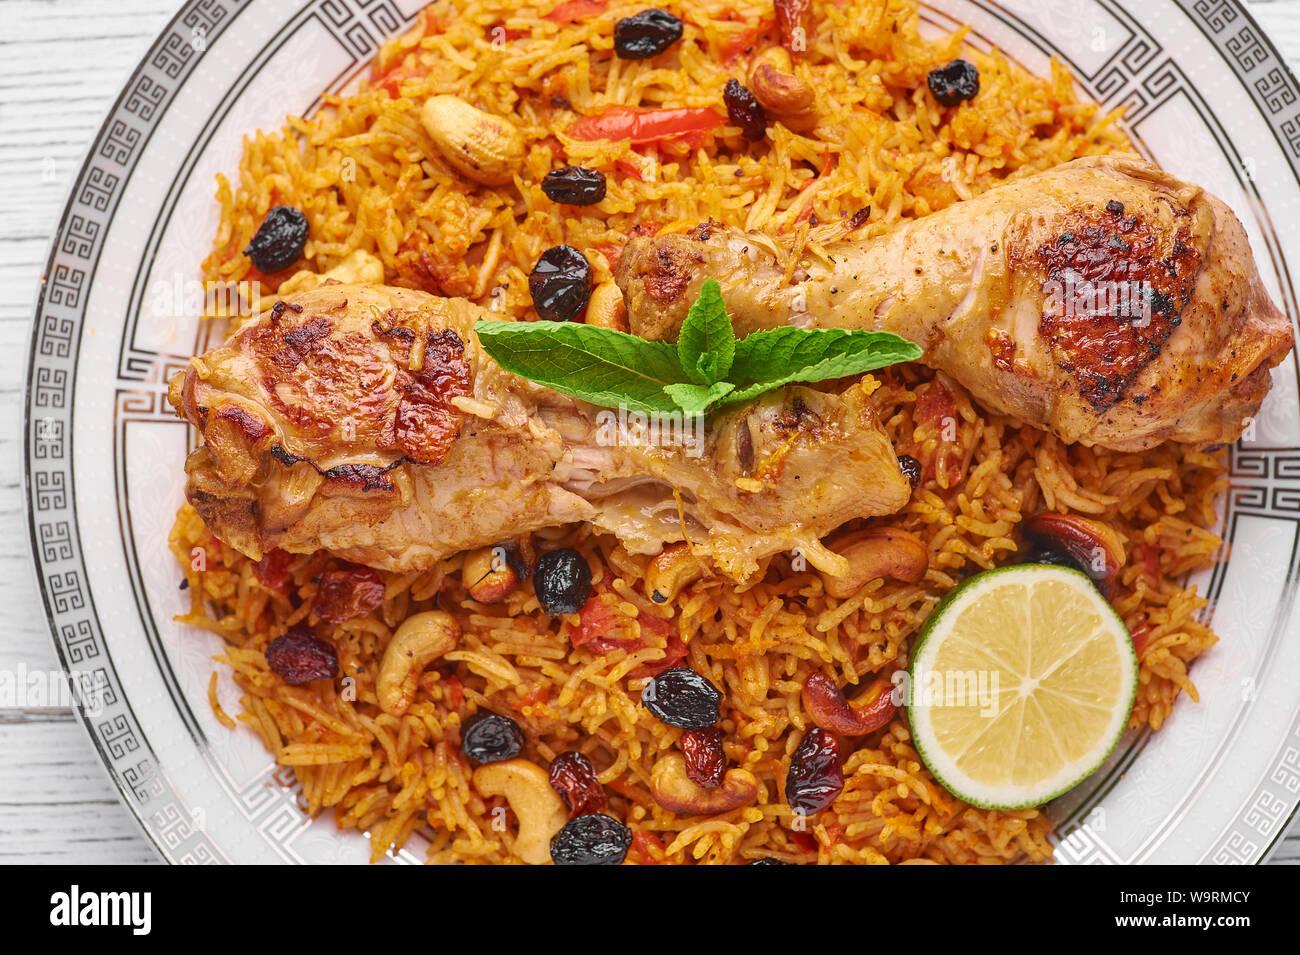 Chicken Kabsa Or Chicken Biryani At White Wooden Background Kabsa Is Traditional Saudi Arabian Cuisine Dish Kabsa Cooks With Basmati Rice Chicken Stock Photo Alamy